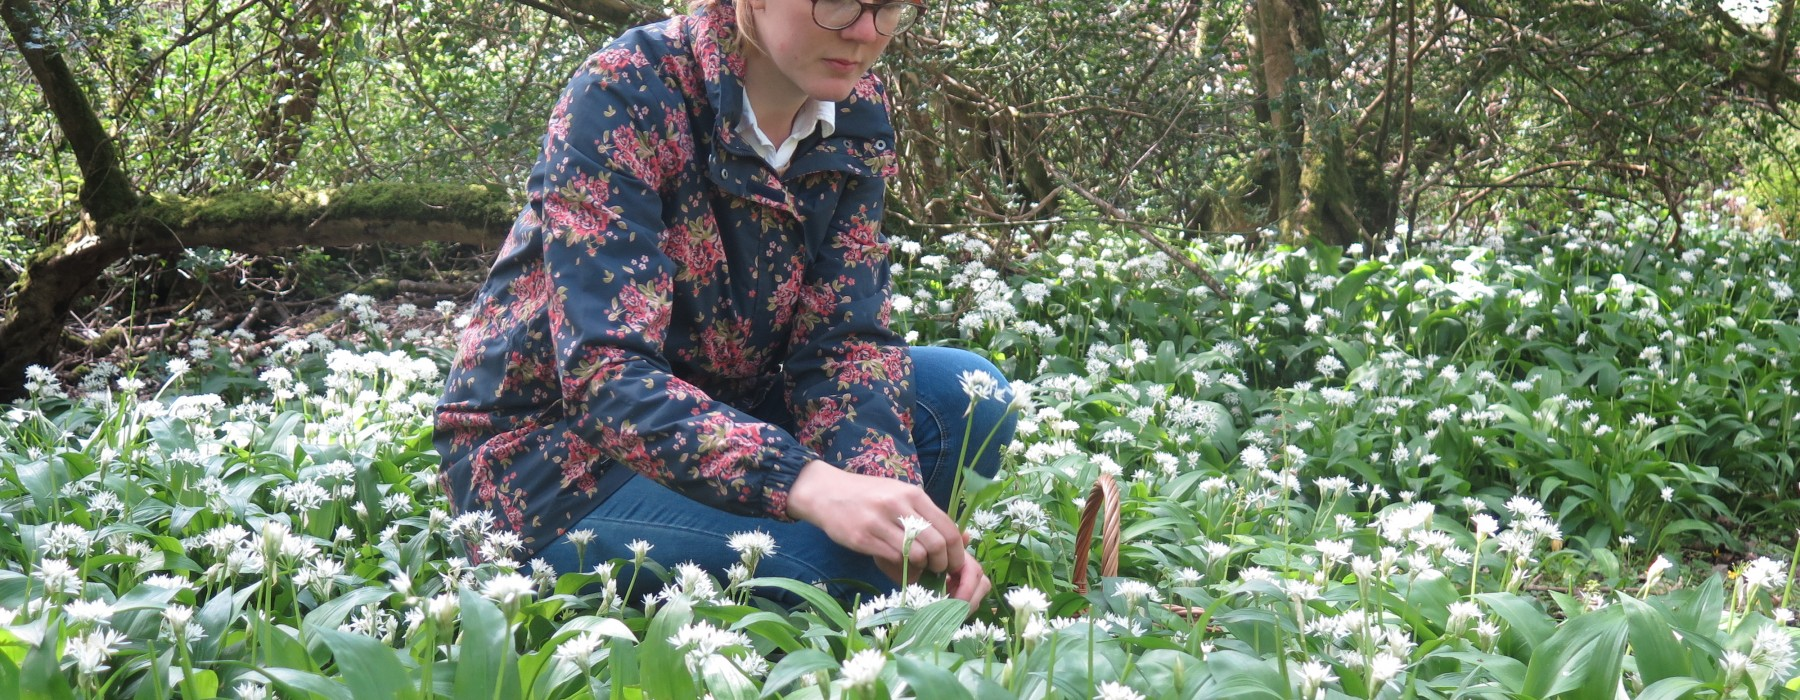 Wild Garlic Season